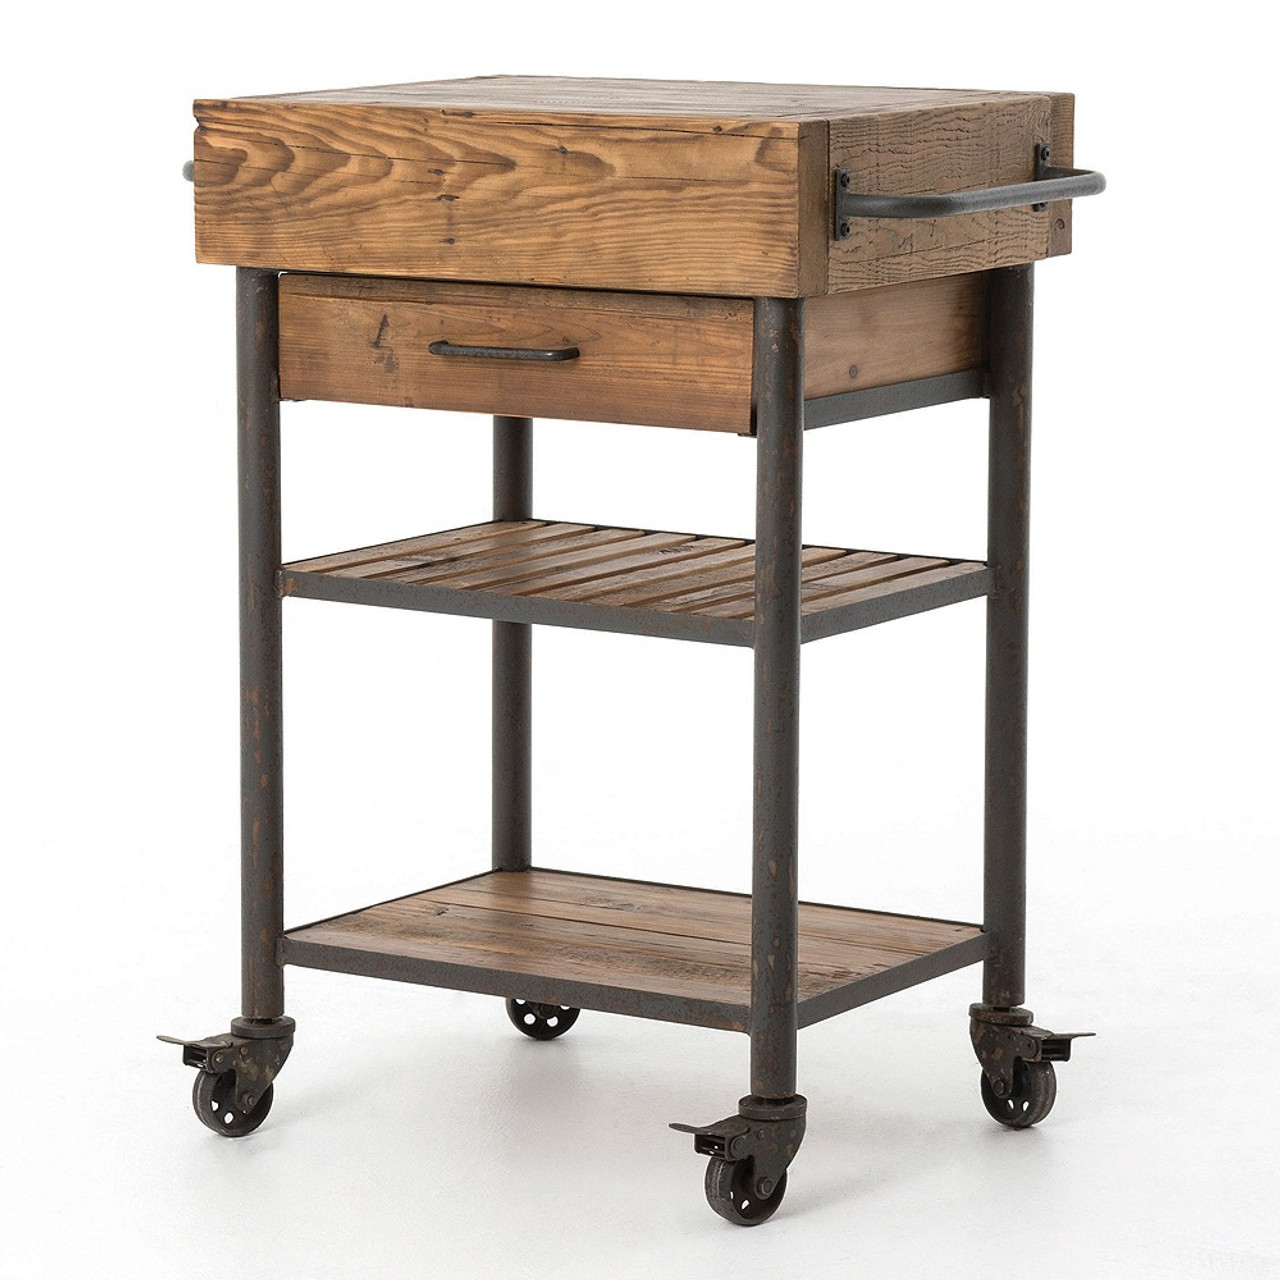 Vintage Kitchen Island Industrial Moving Rolling Cart: Industrial Reclaimed Wood Rolling Kitchen Island Cart